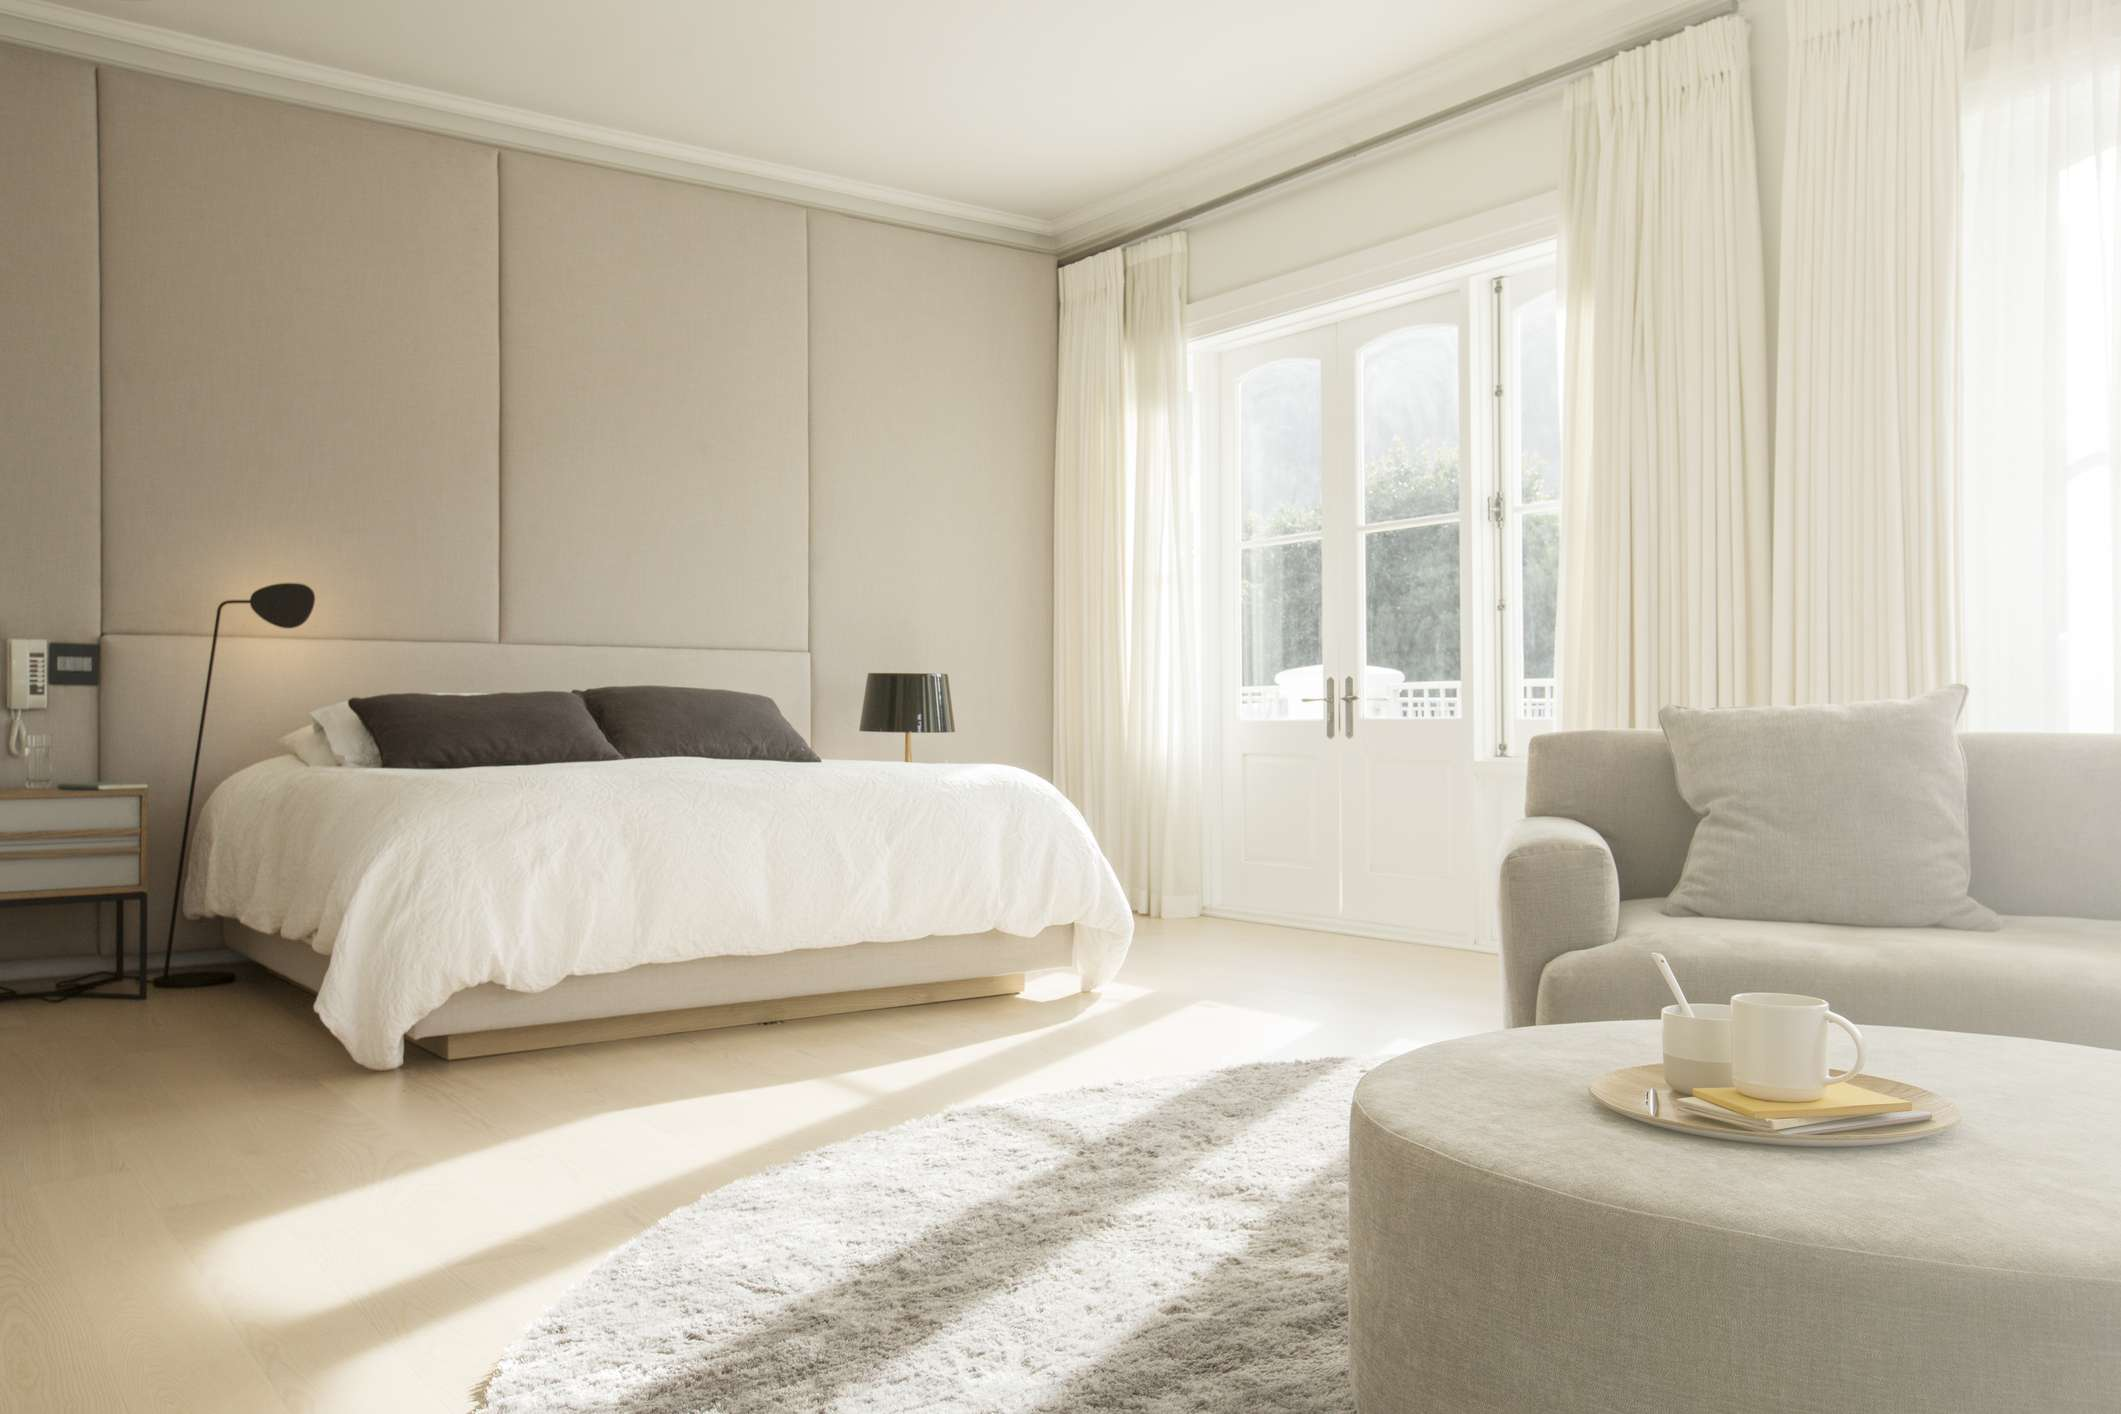 bedroom feng shui design. Bedroom Feng Shui Design E